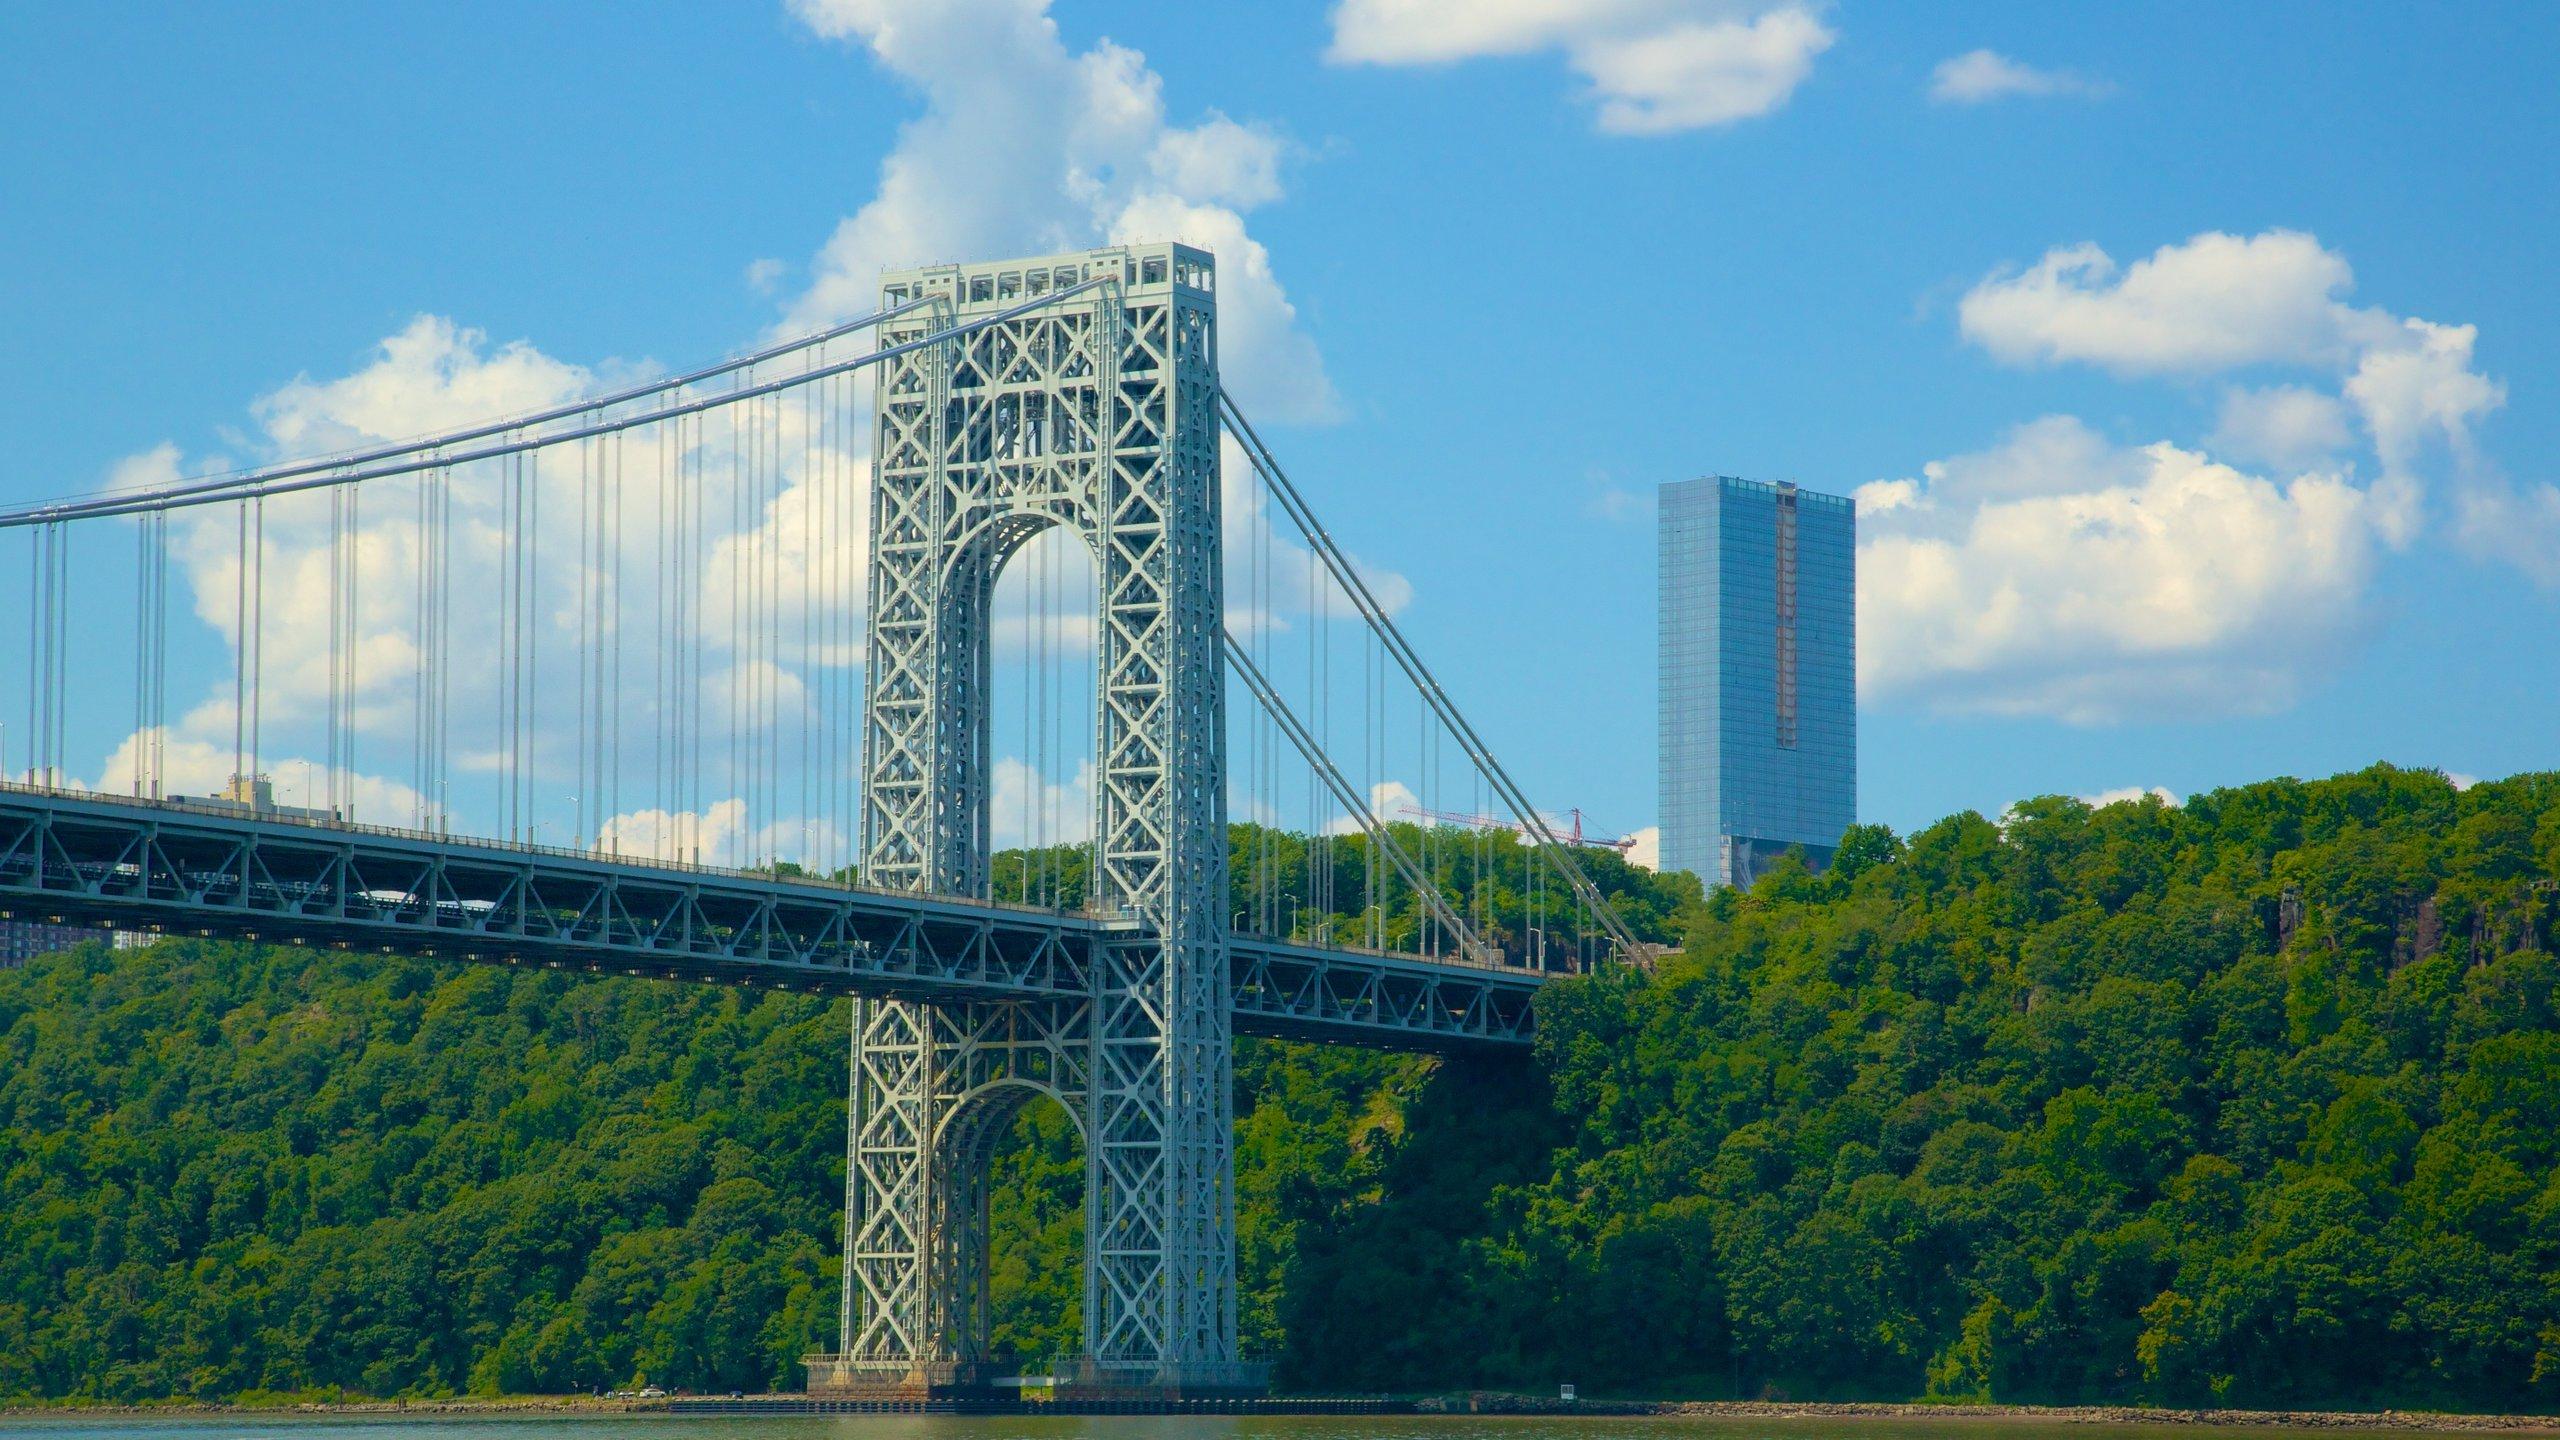 Upper Manhattan, New York, New York, USA